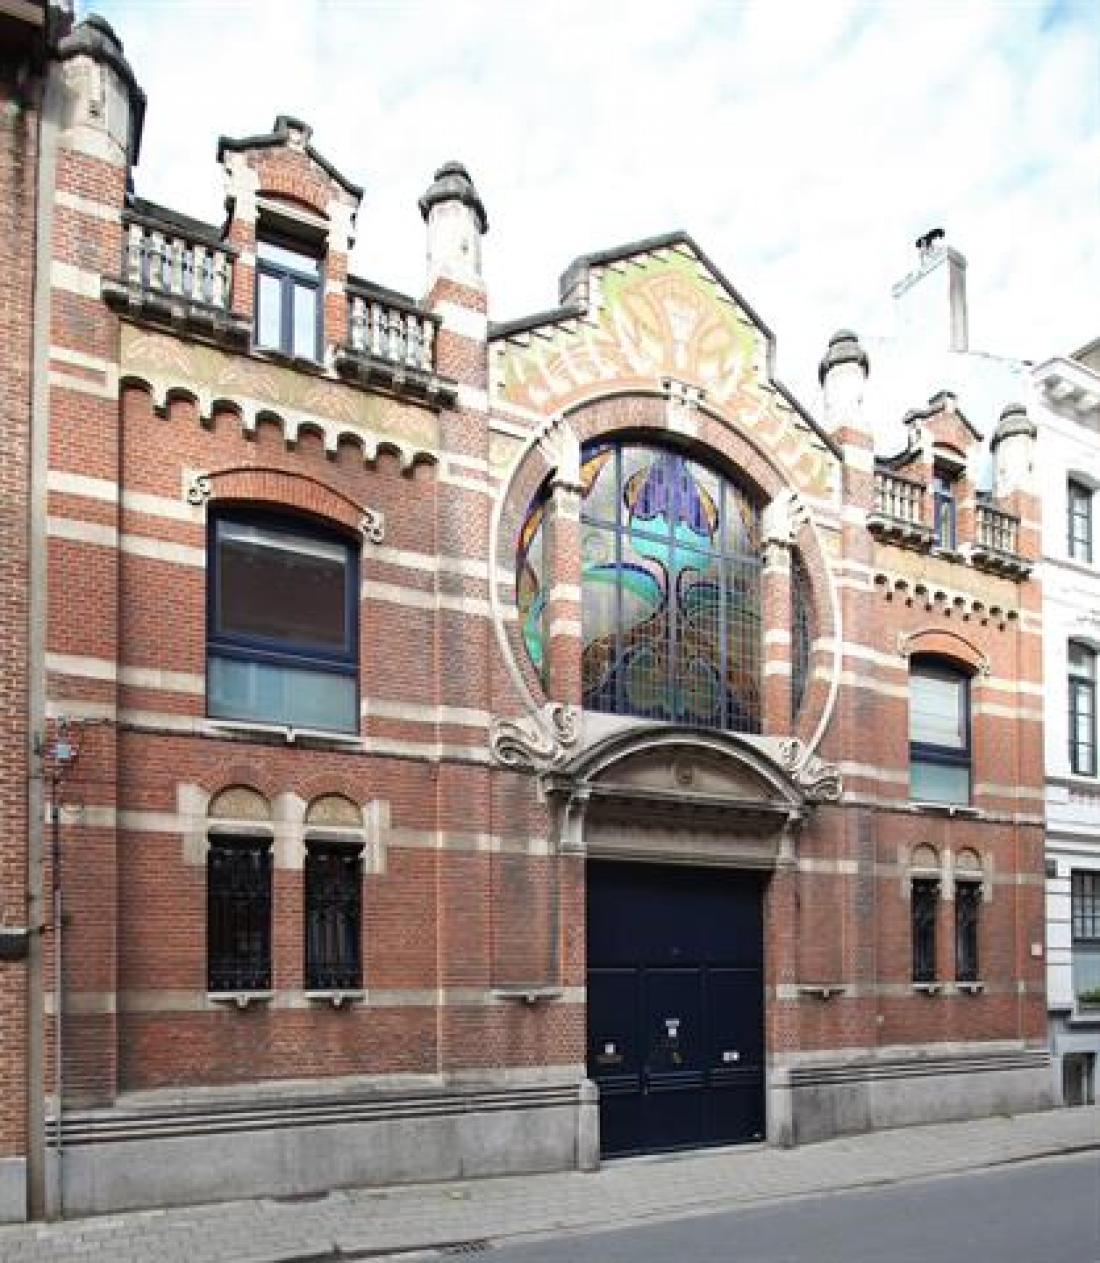 Spectaculair koetshuis in art-nouveaustijl